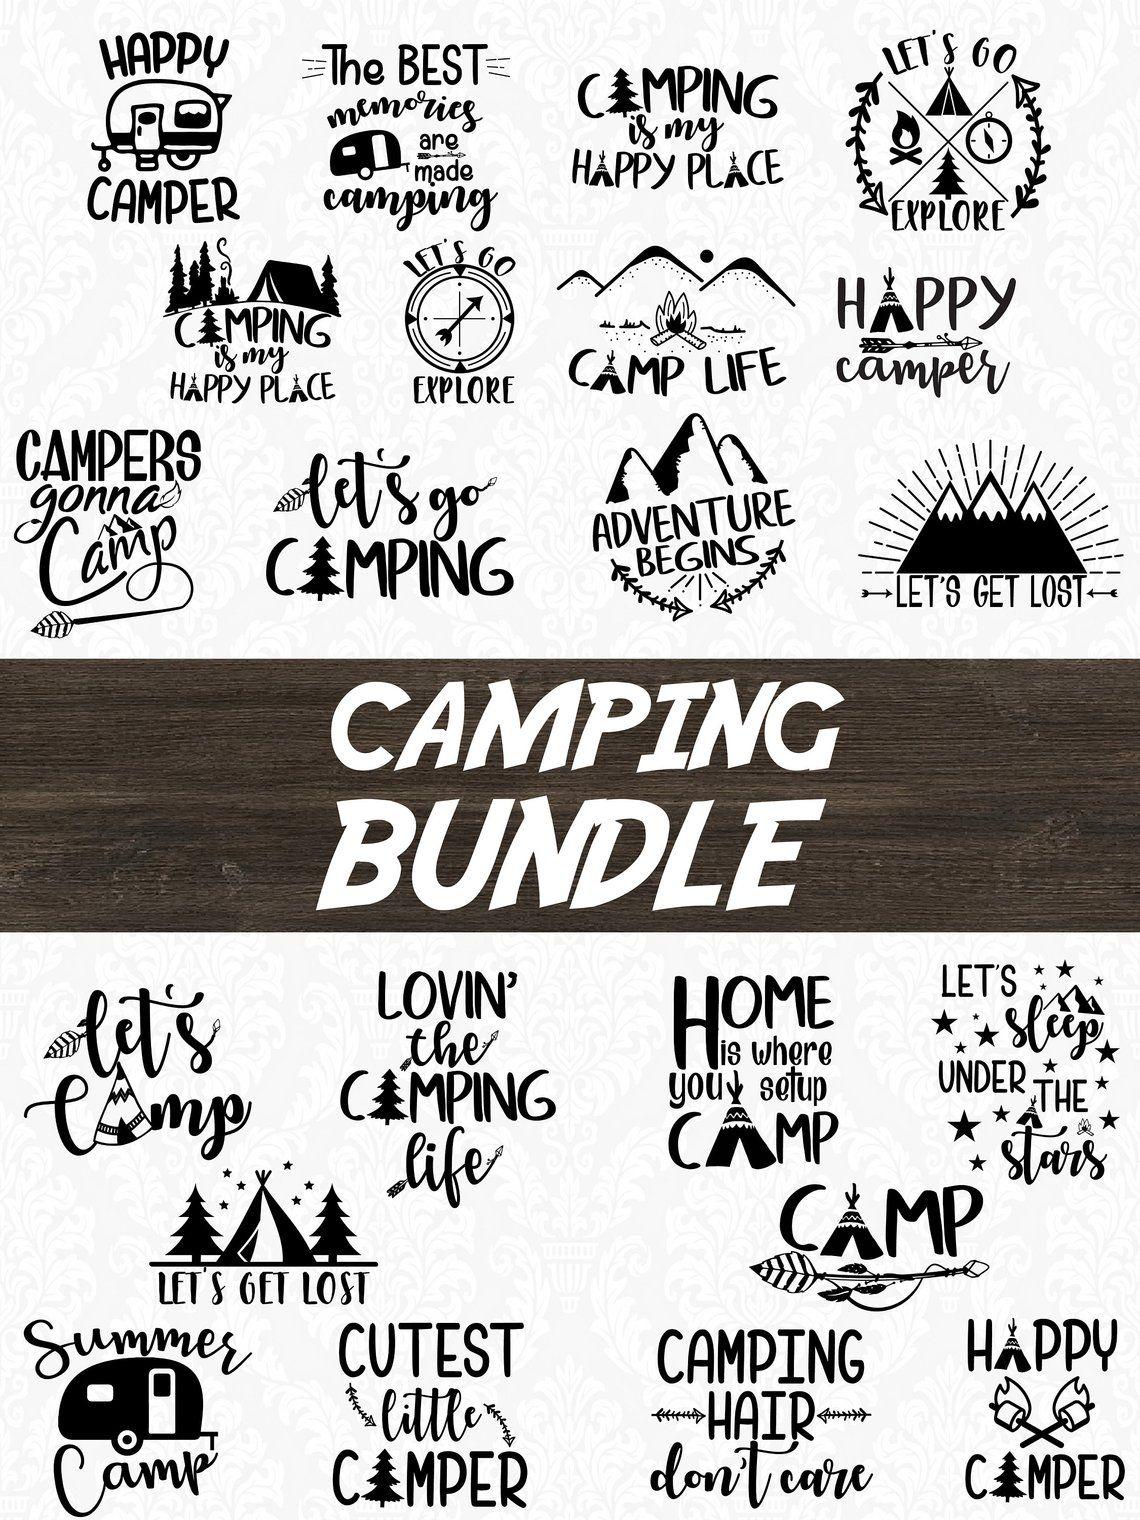 Camping Svg : camping, Cricut, Ideas